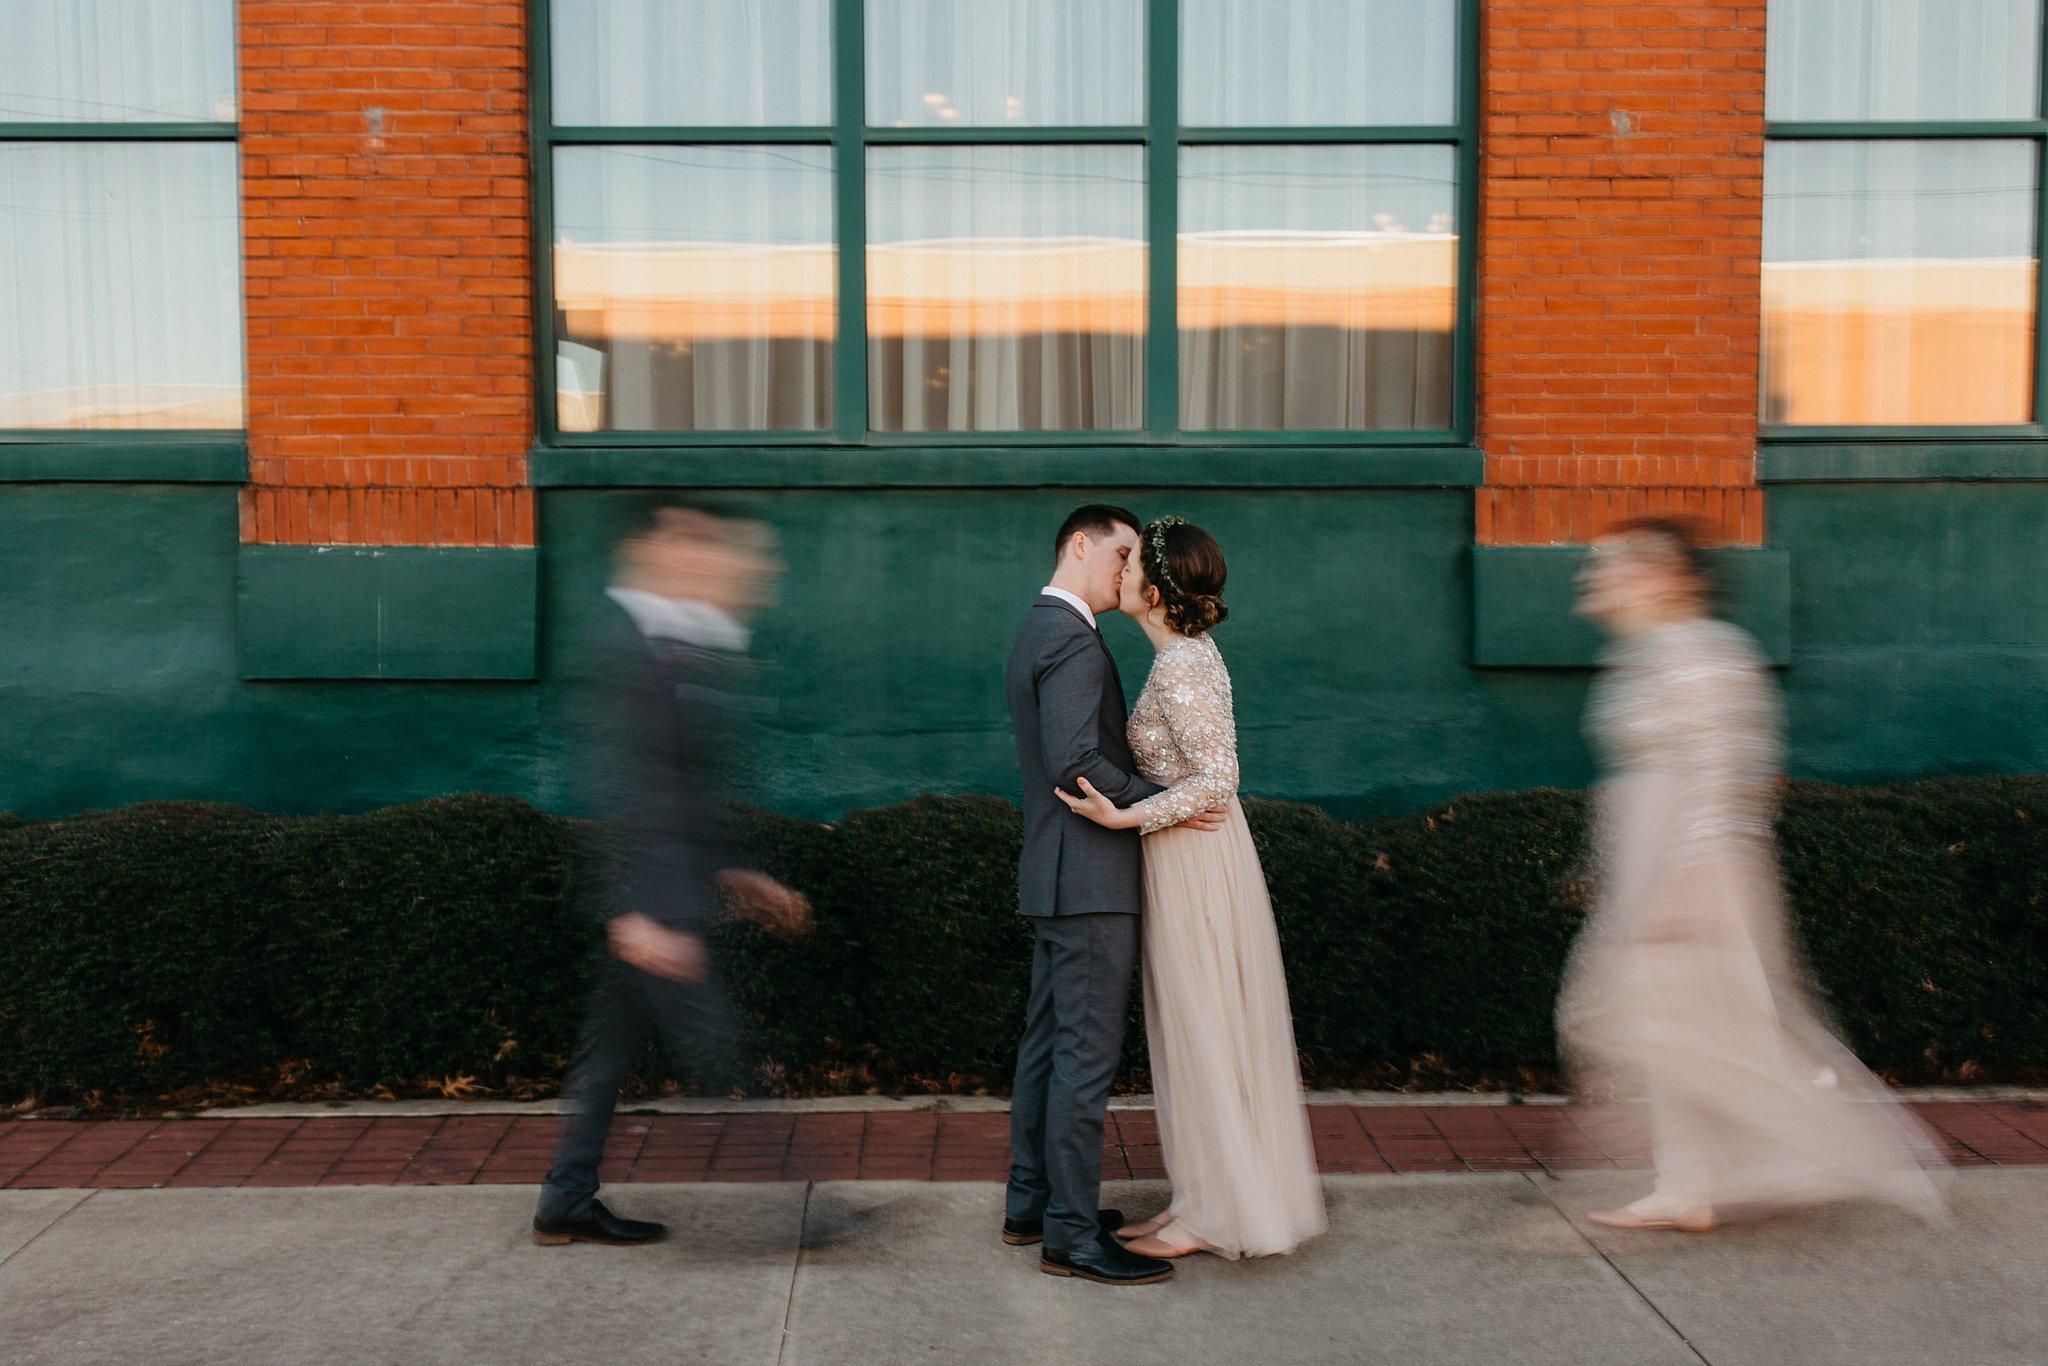 Wilderlove Co_Waco Texas_The Phoenix_Romantic Wedding Photography_0039.jpg